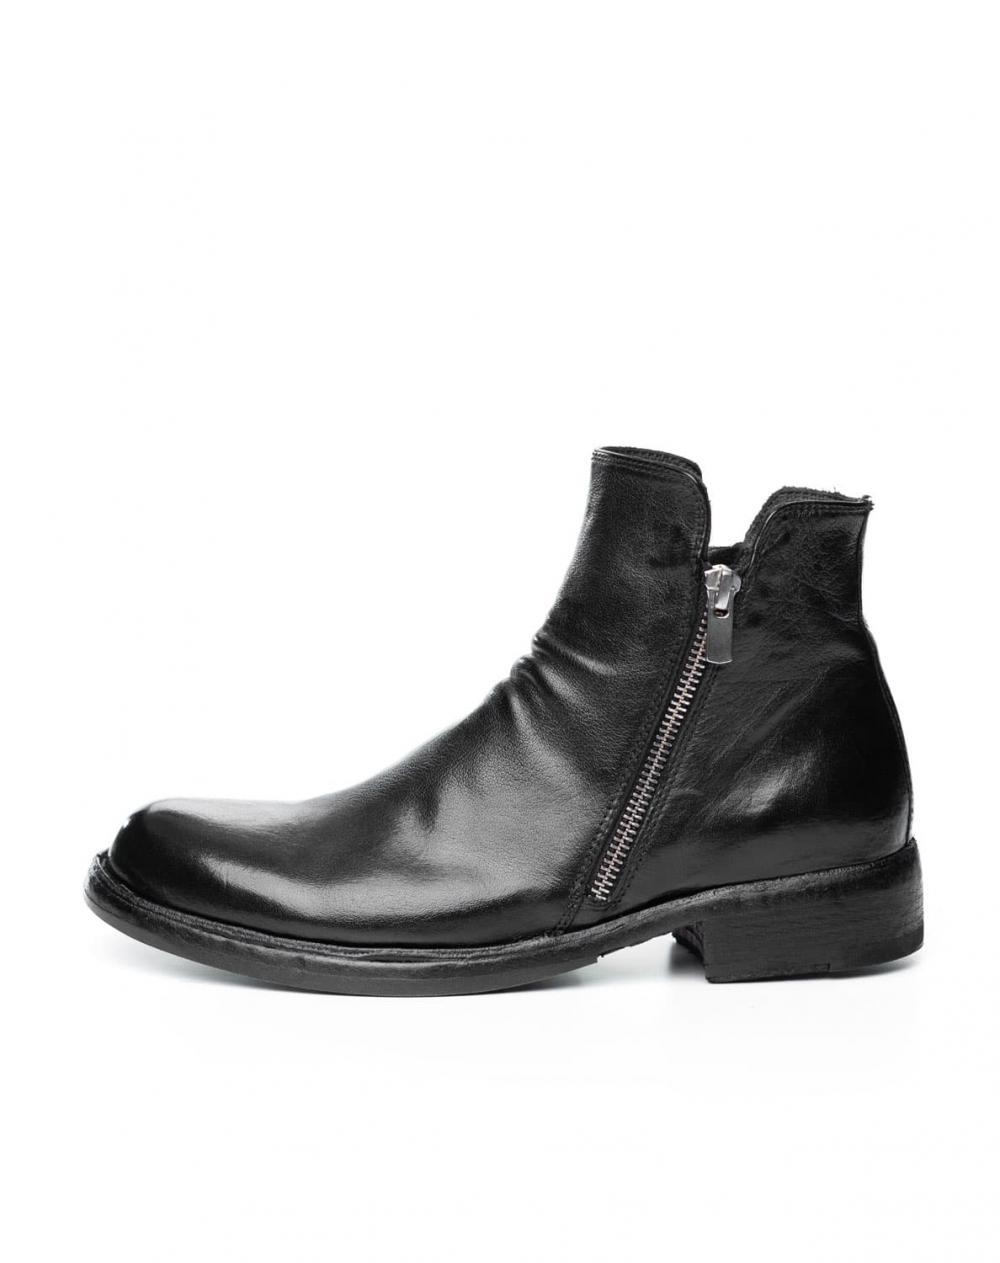 Boot Legrand 105